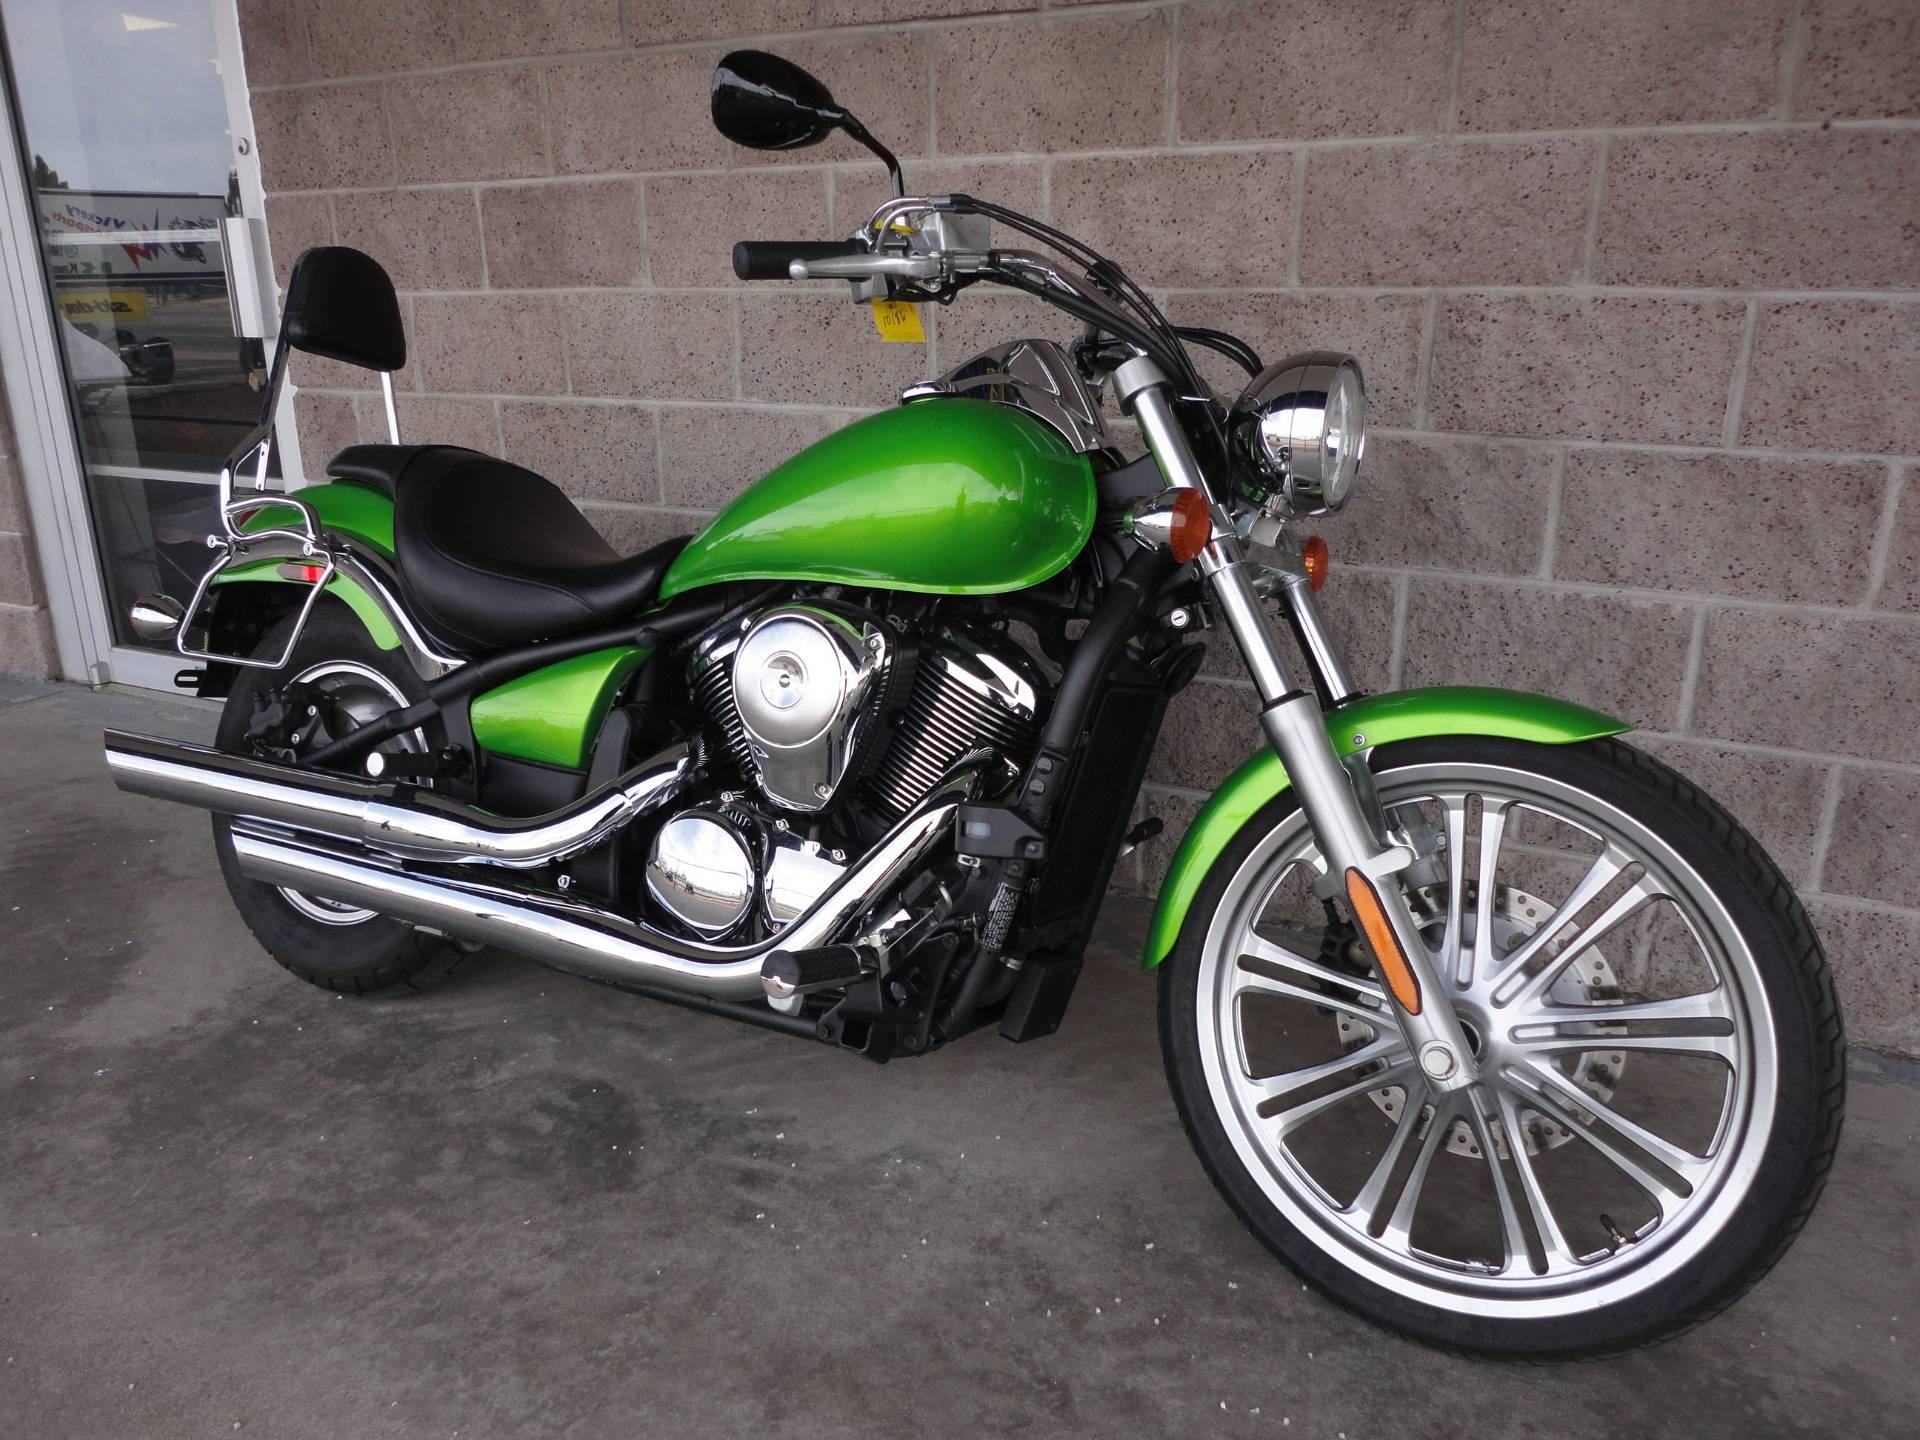 2008 Kawasaki Vulcan® 900 Custom in Denver, Colorado